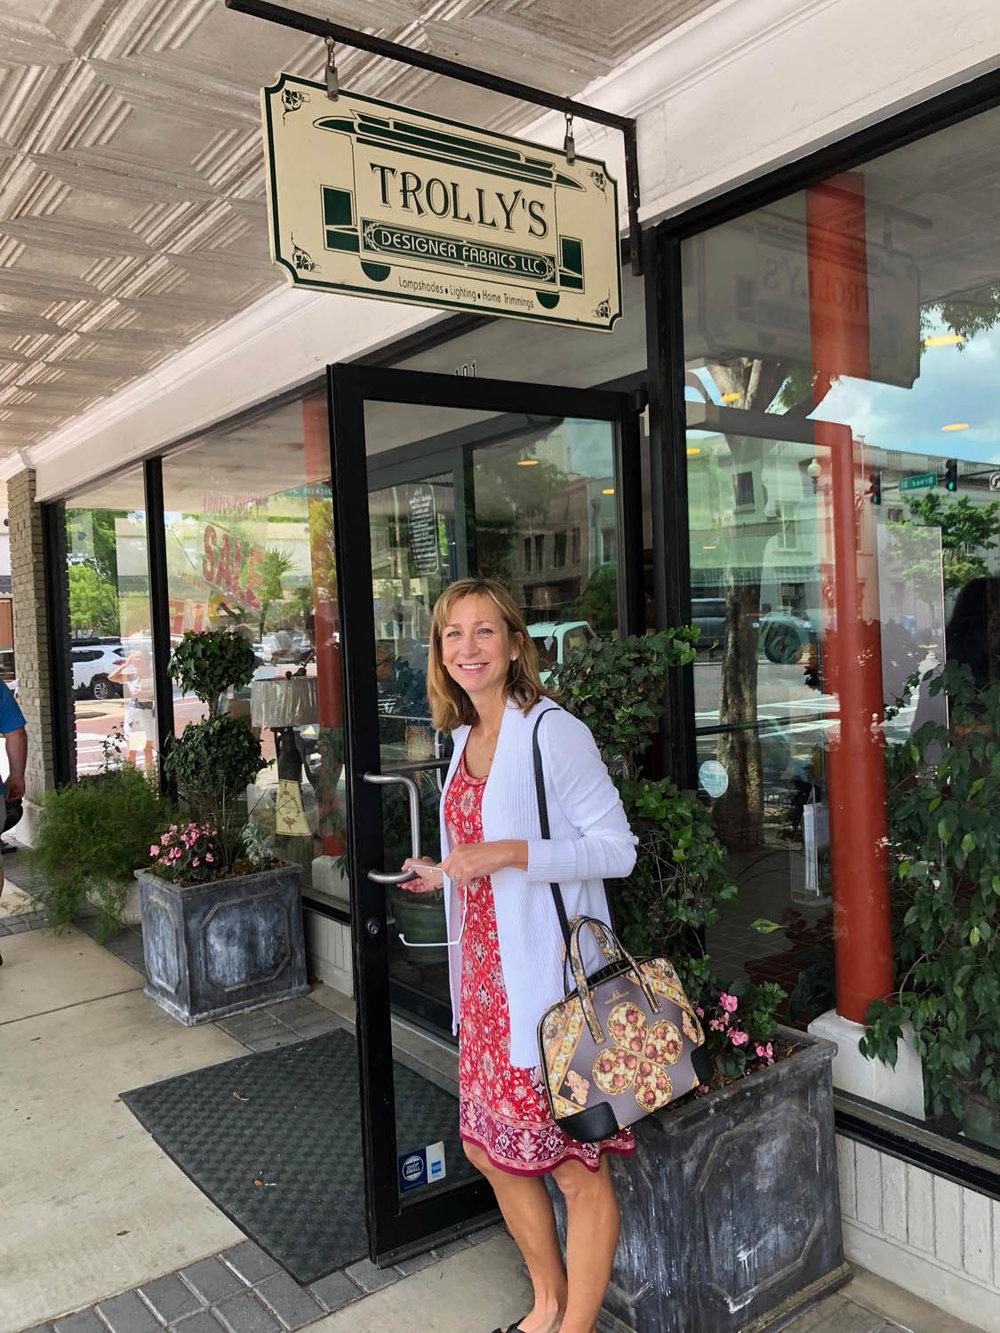 Ashley at the store entrance of Trolly's Designer Fabrics, LLC